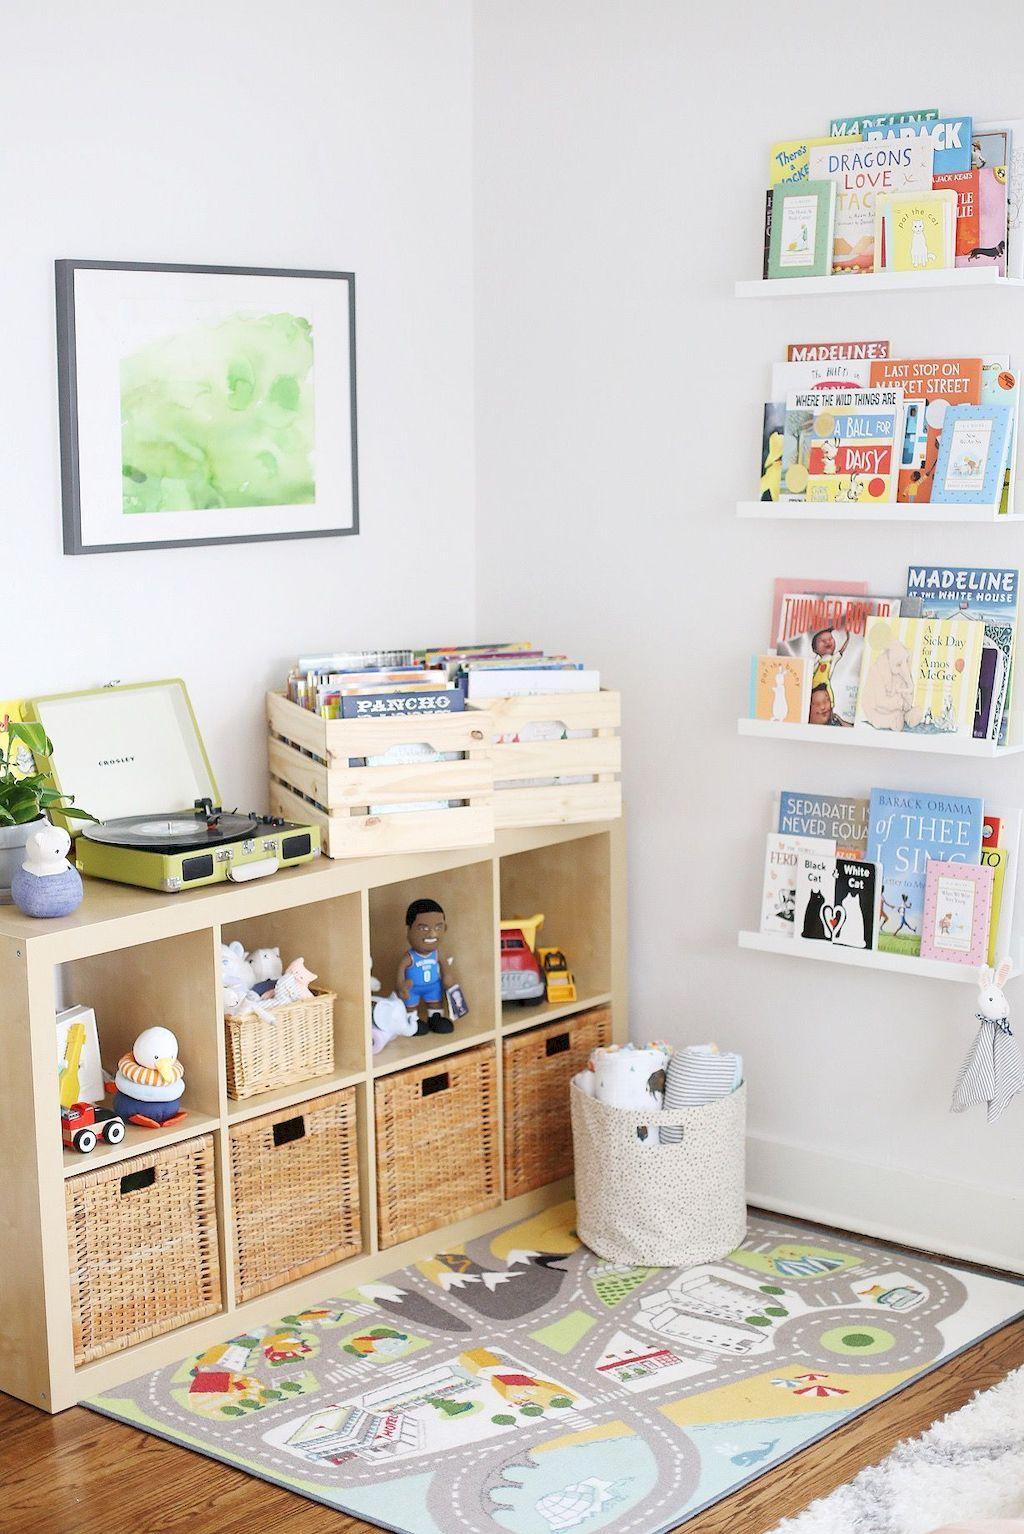 Smart Ideas For Amazing Bedroom Storage Home To Z Diy Bedroom Storage Girls Bedroom Storage Kids Storage Living room toy storage